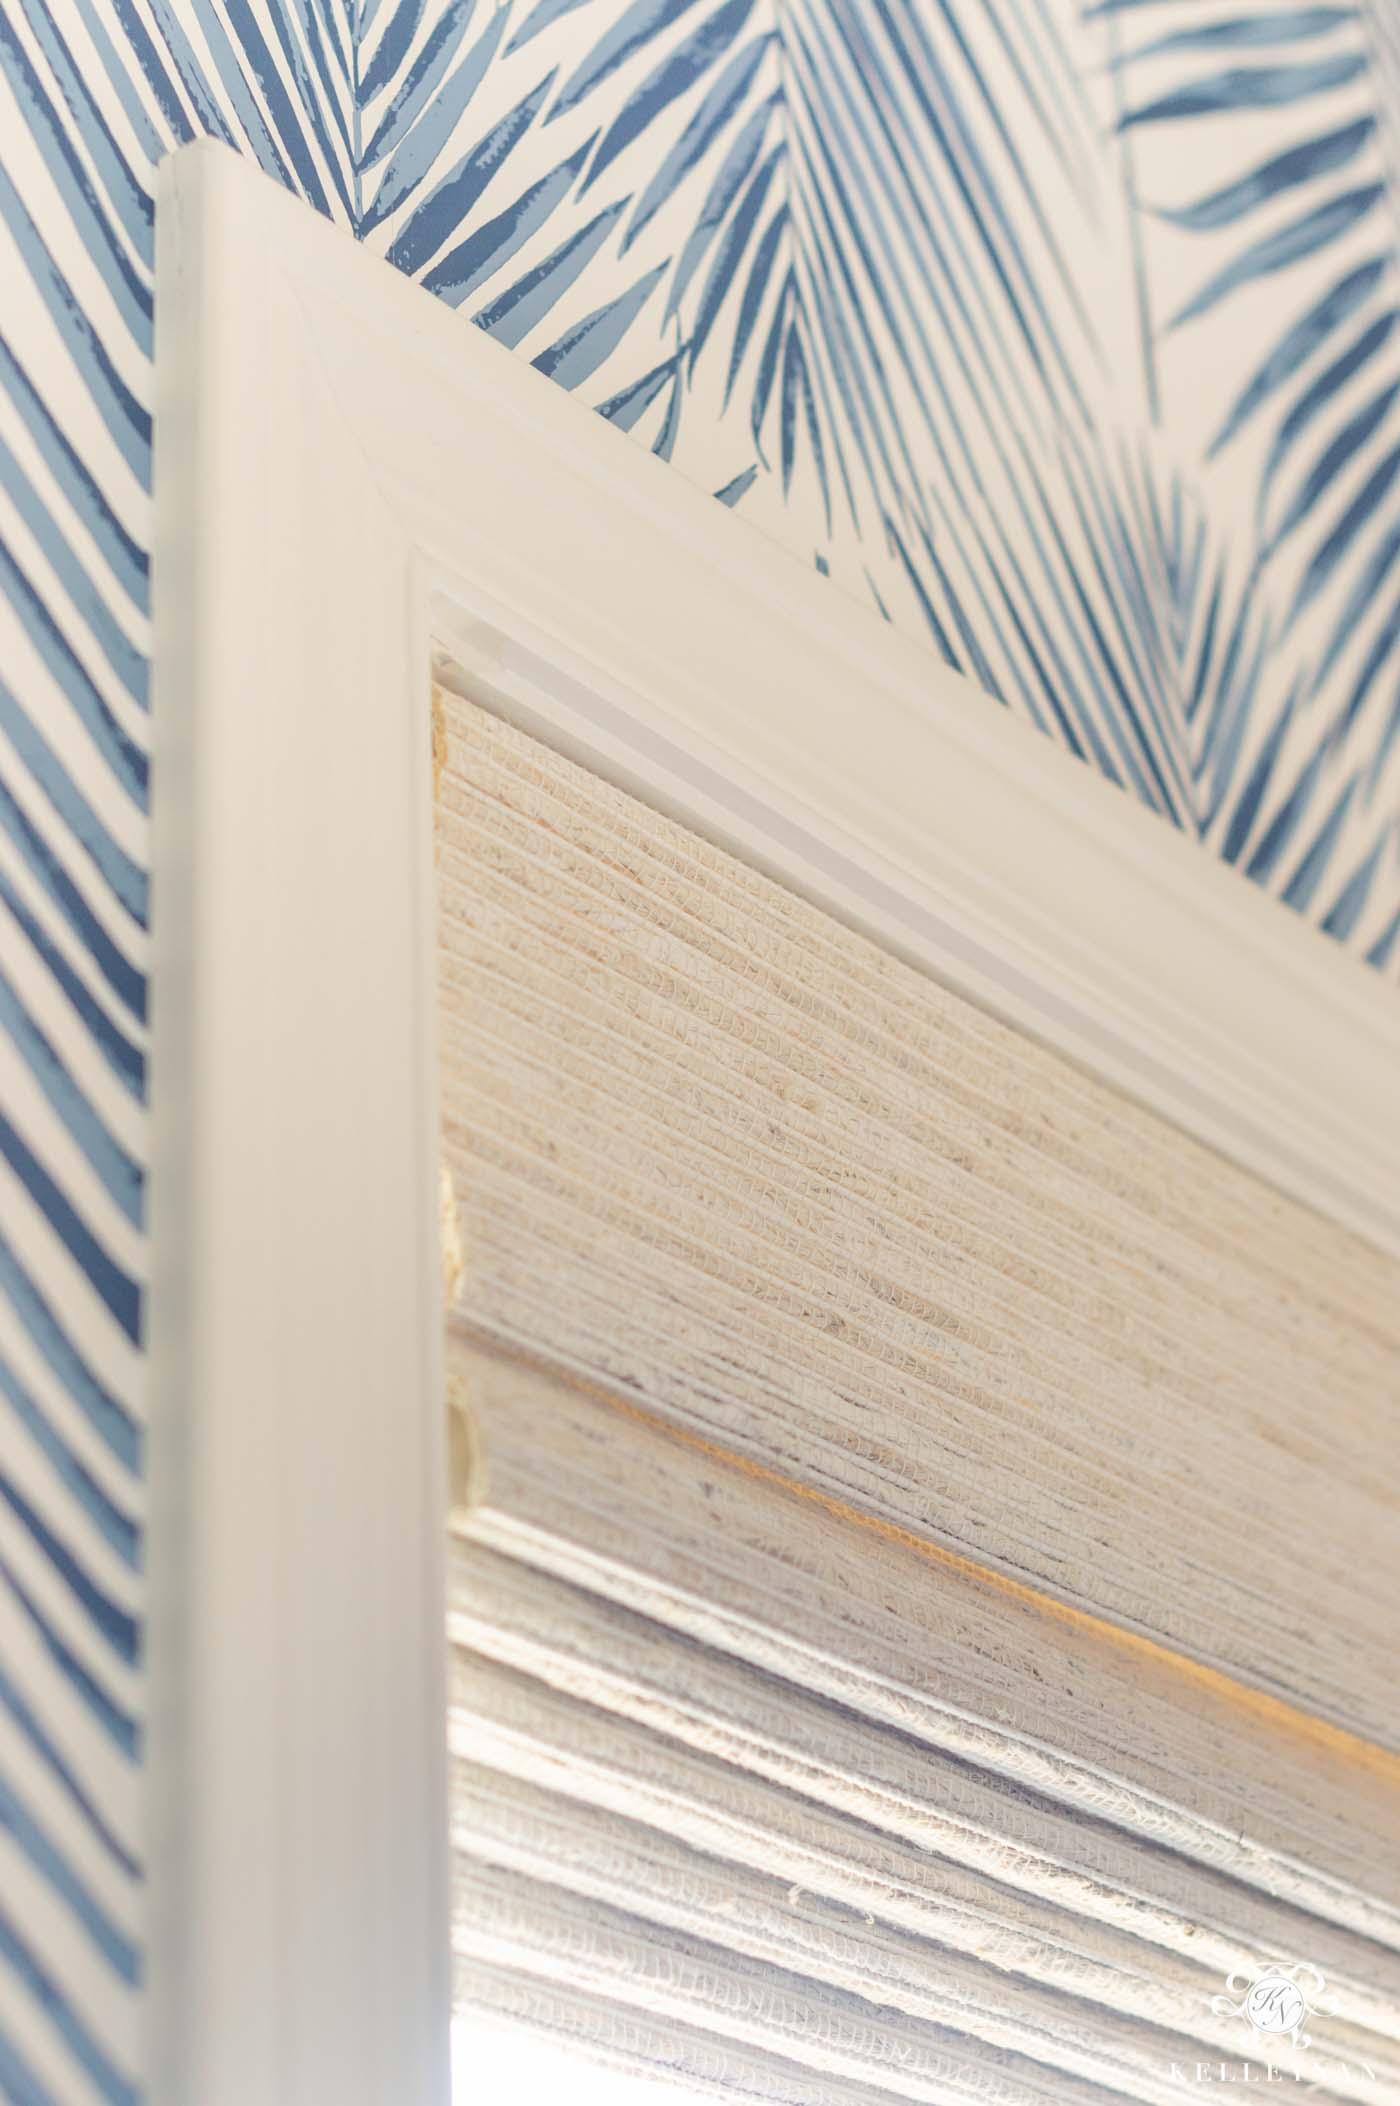 Powder Room Shades and Window Treatment Ideas